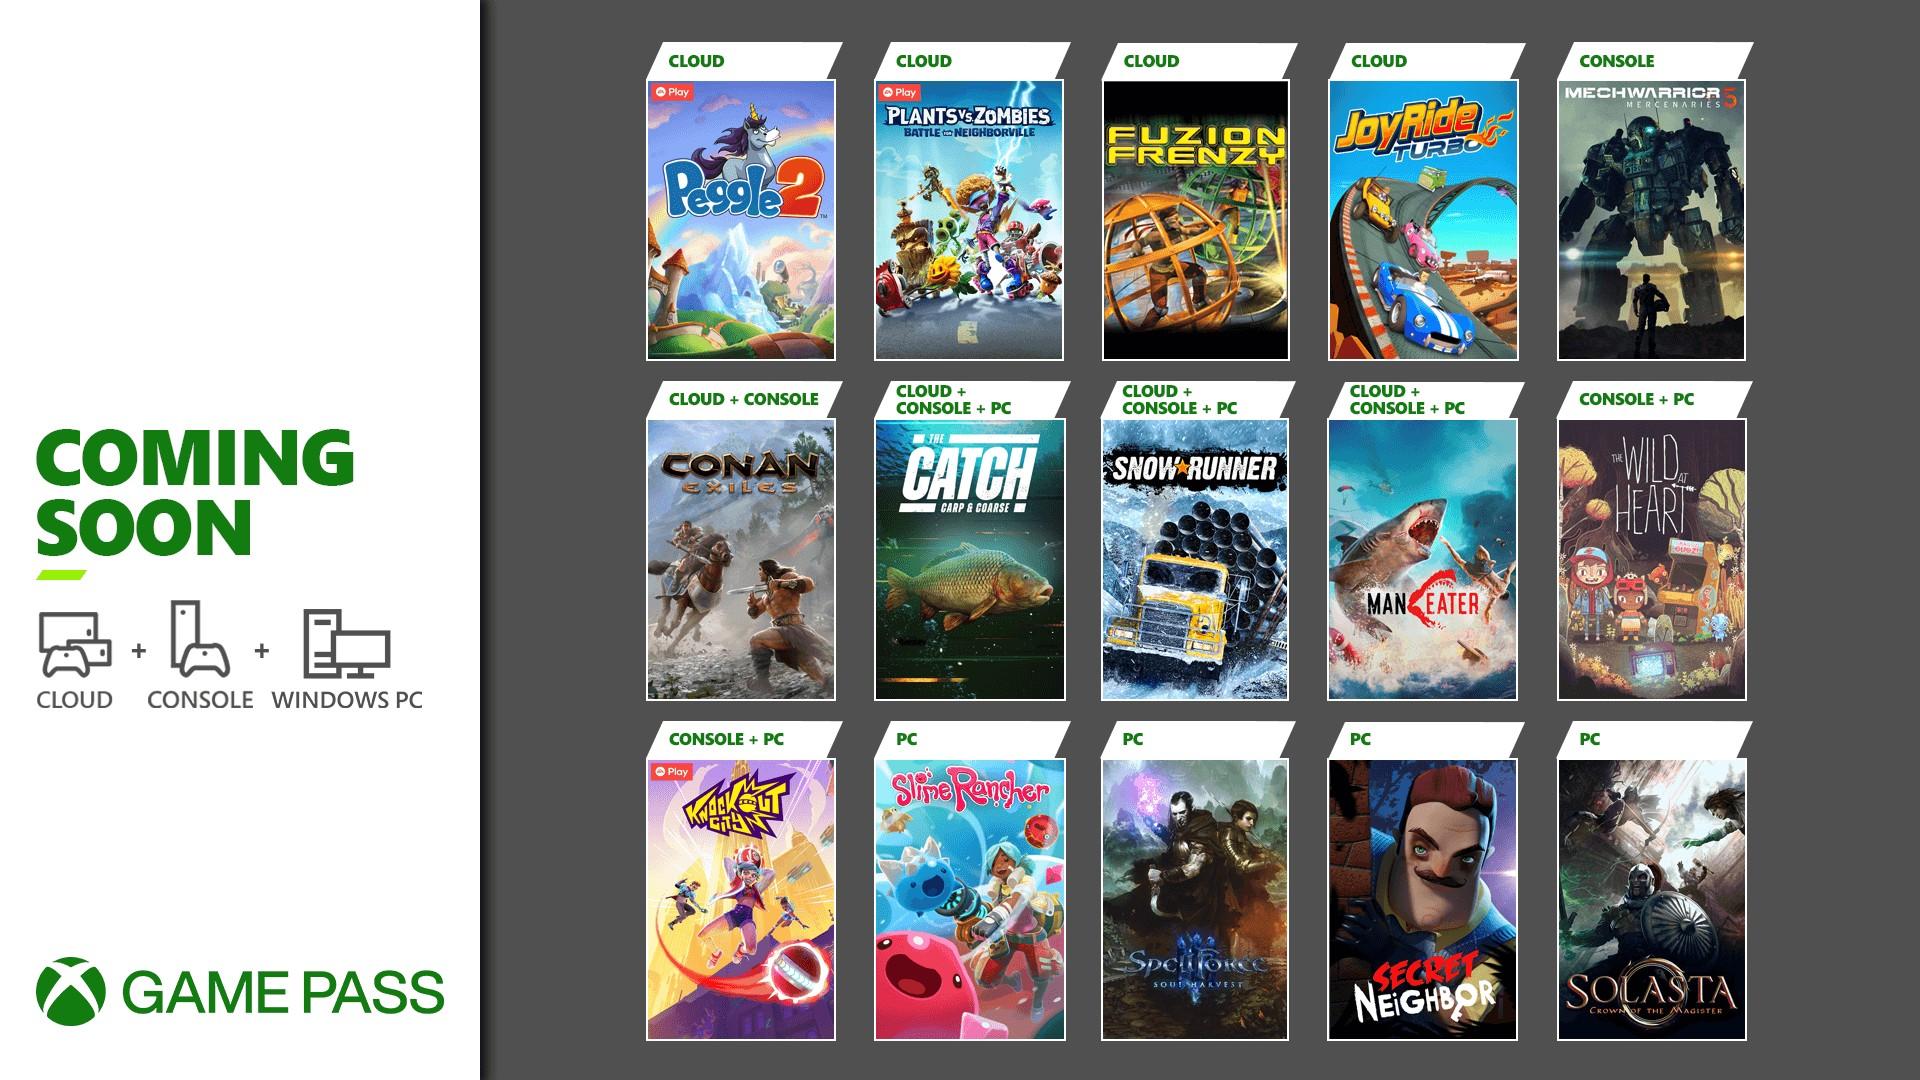 XGP五月新增游戏:《雪地奔驰》《幻幻球2》《植物大战僵尸:邻里之战》等